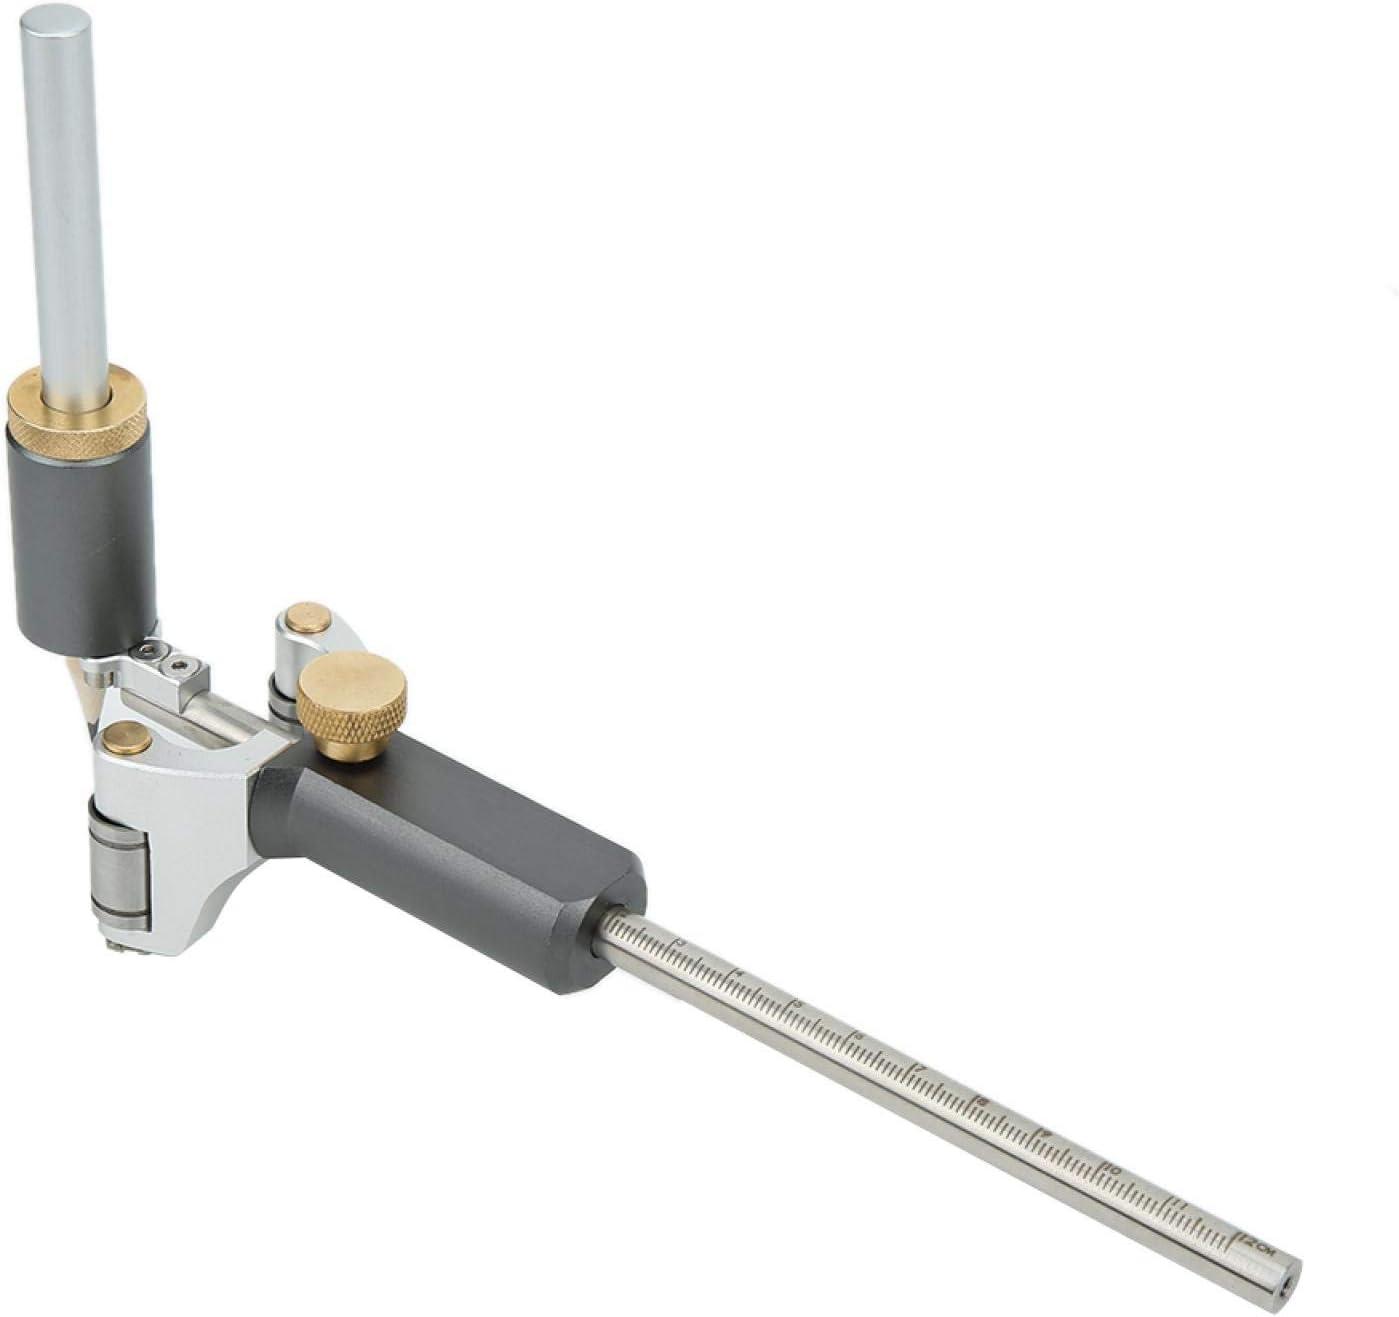 Marking Gauge, Line Maker Measuring Tools, Multi‑Function A